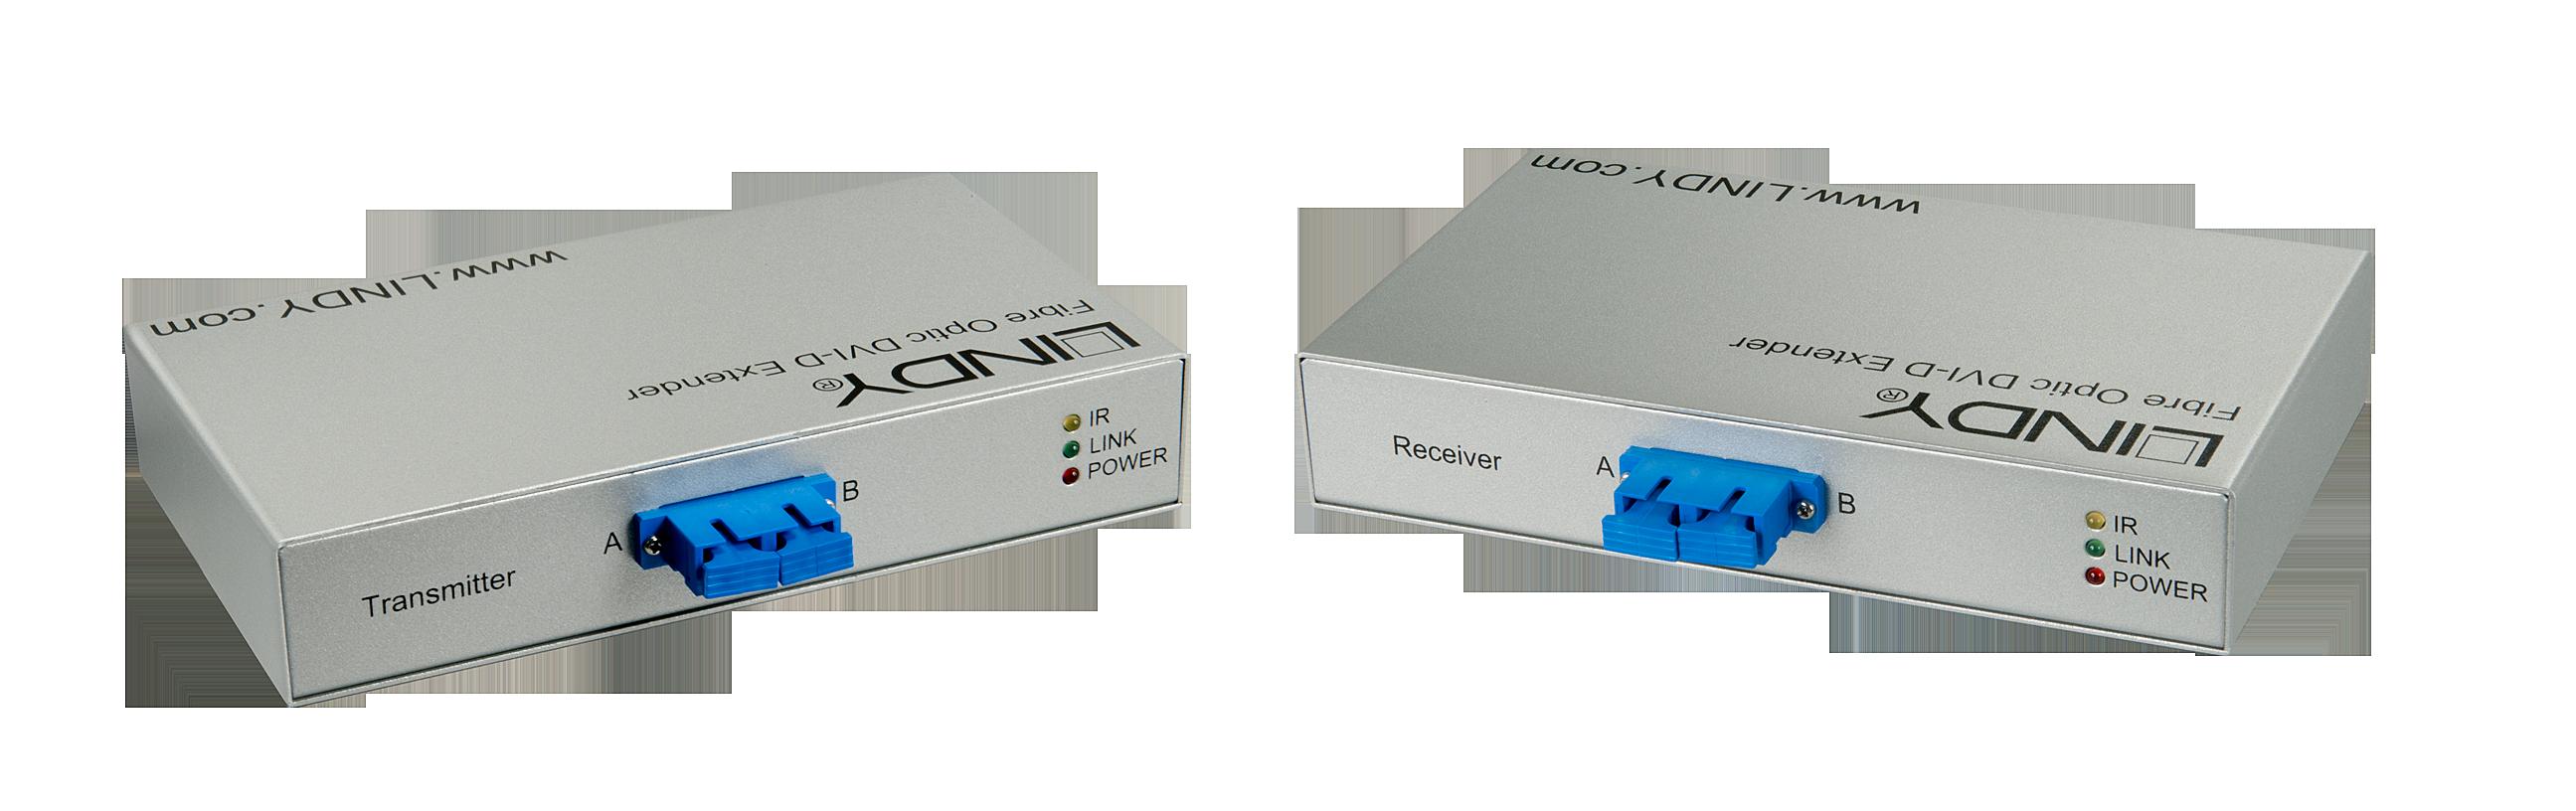 DVI-D Extender Fiber / LWL Single Link 5000m